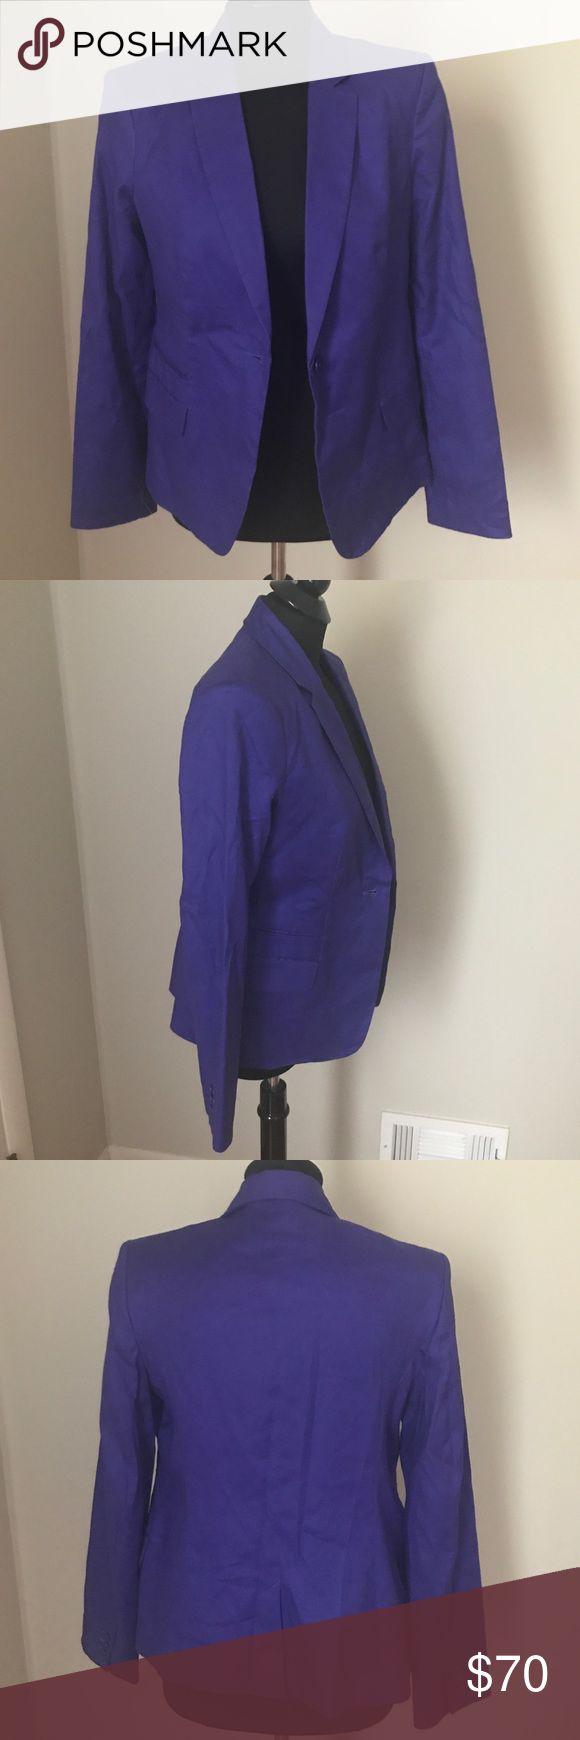 Calvin Klein Blazer NWT New with tags Calvin Klein Blazer in Indigo blue. Calvin Klein Jackets & Coats Blazers